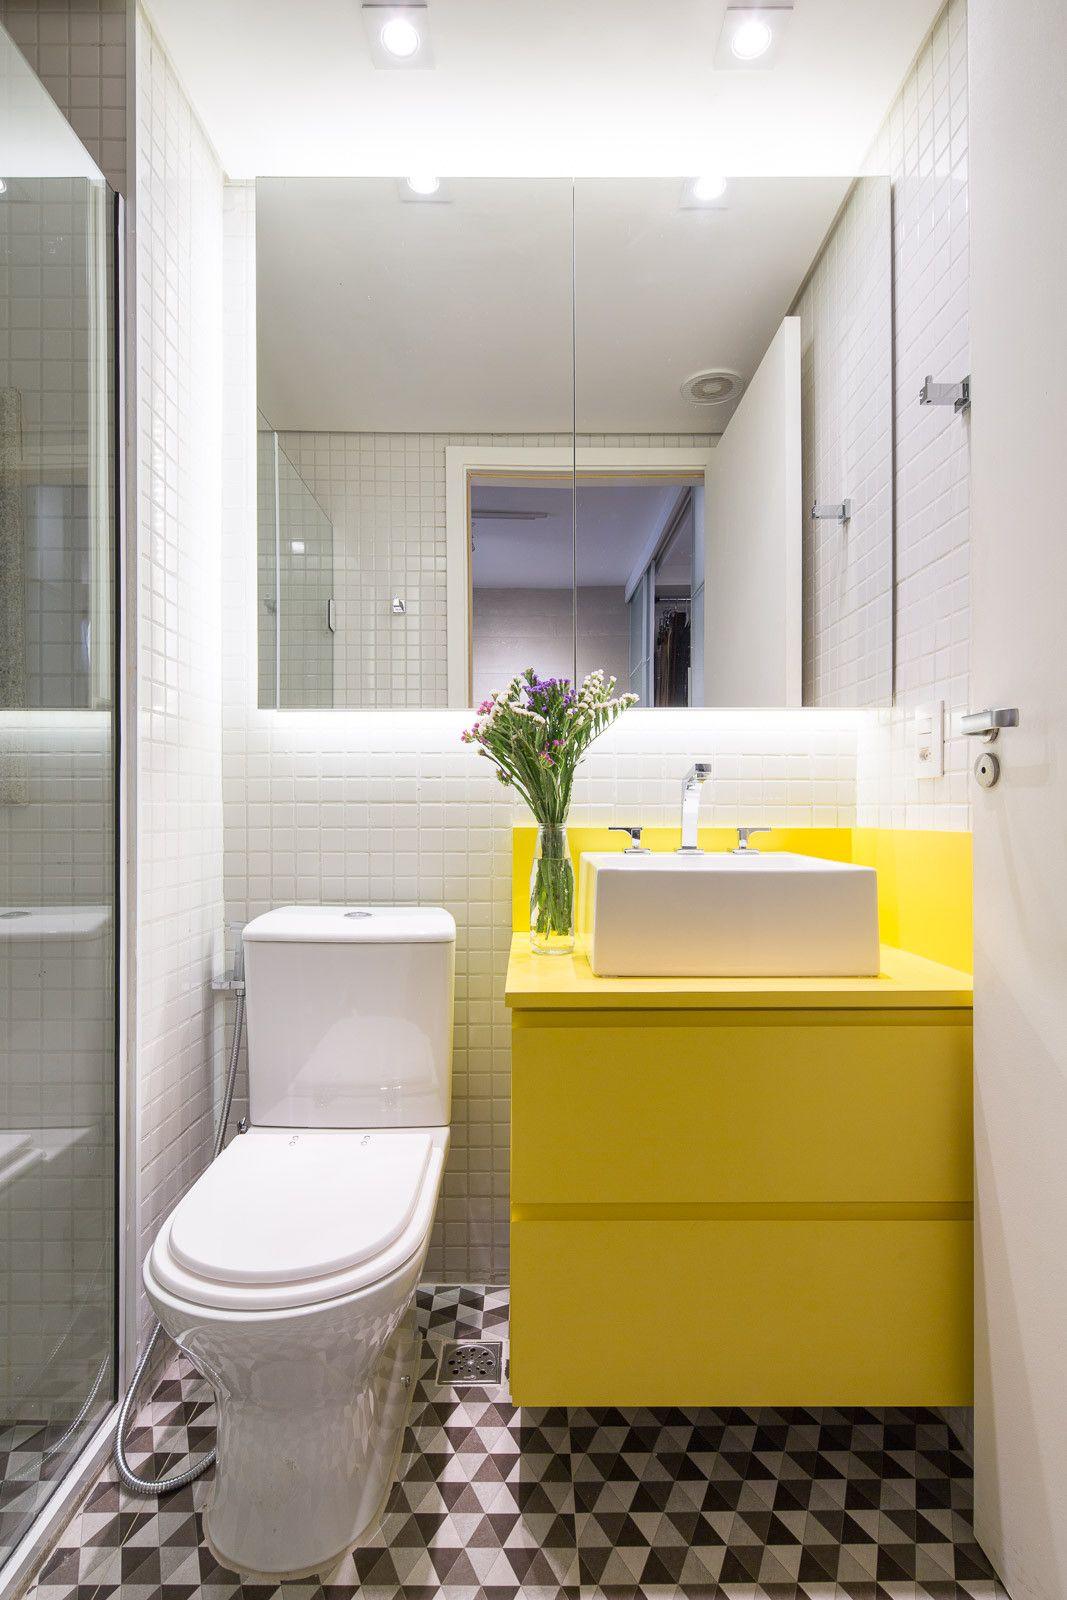 Apartamento trama l arquitetos semerene arquitetura interior park sul brasília df brasil clarice semerene colaboradora fernanda abreu área 70m²